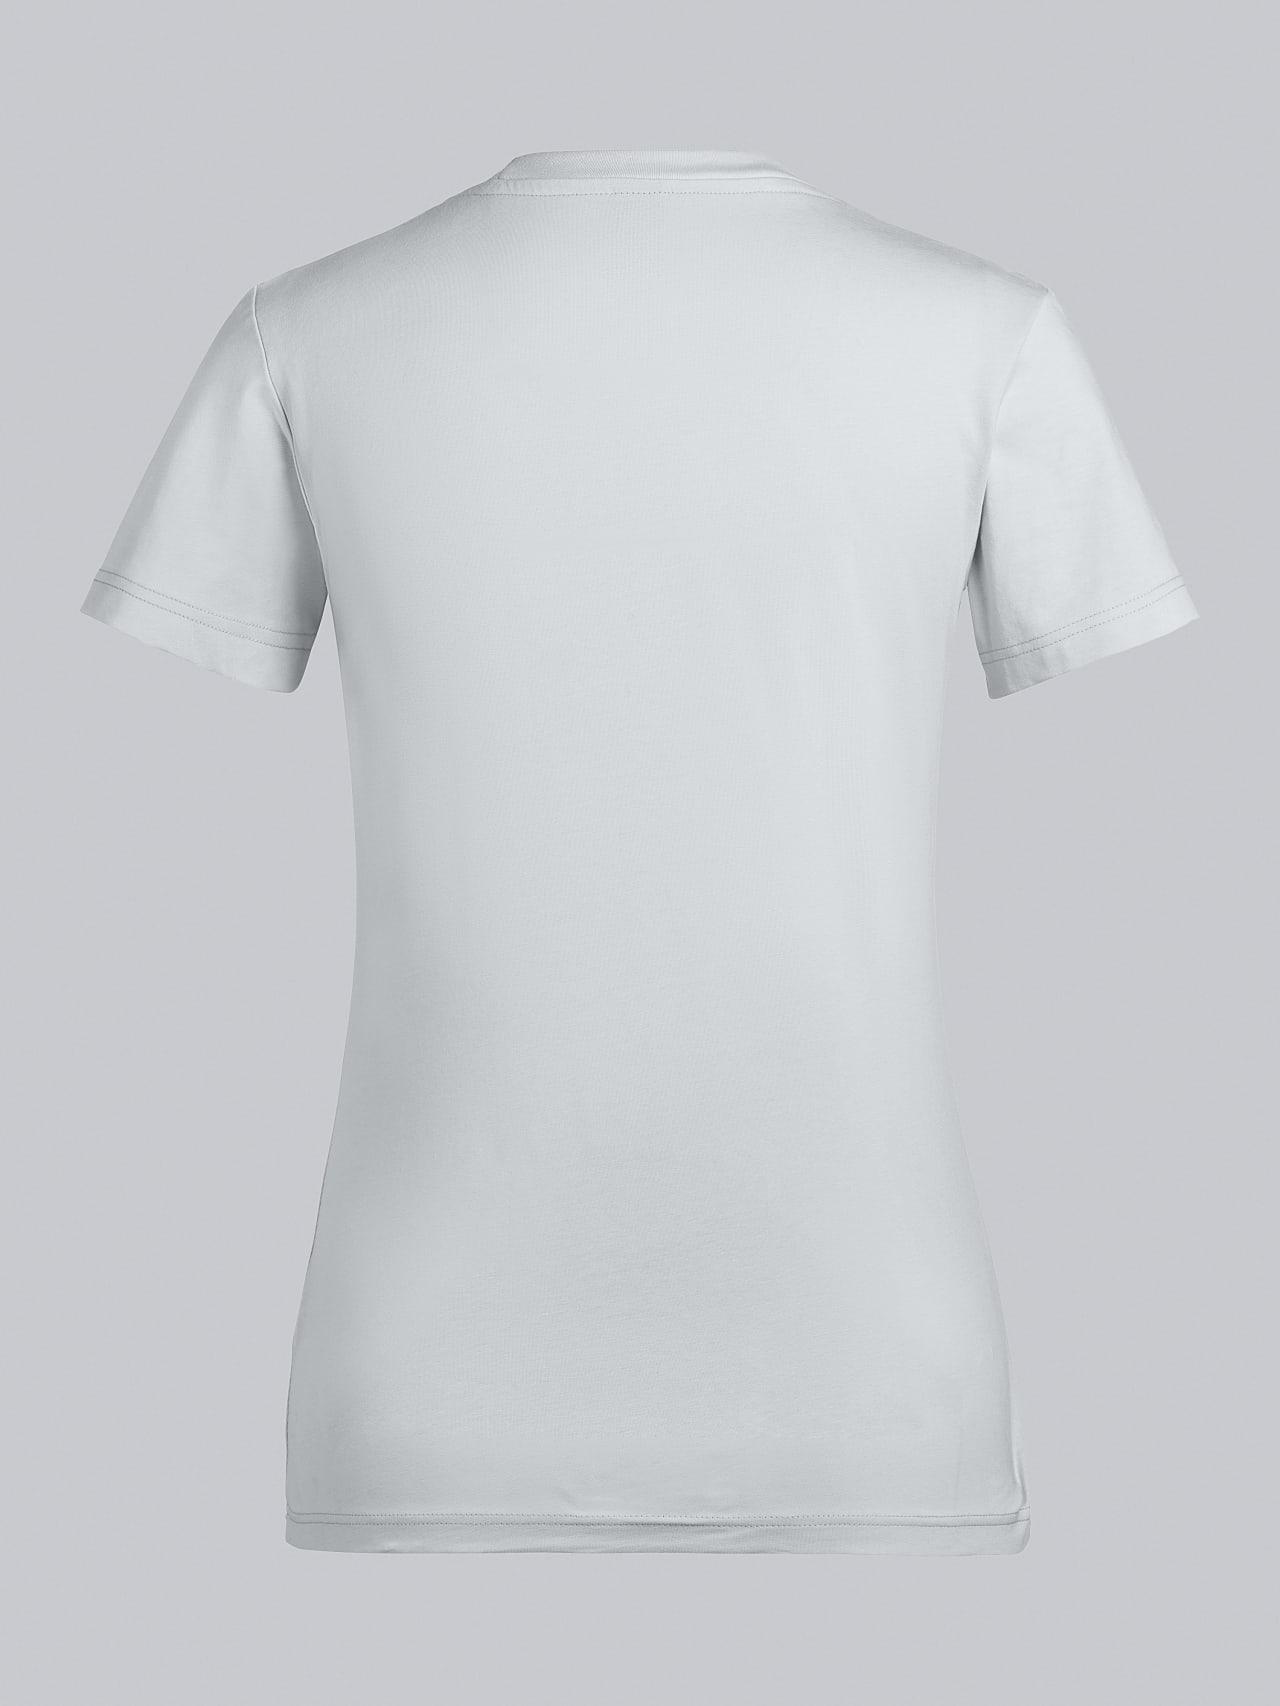 JOCTI V3.Y5.02 Logo T-Shirt Pale Blue  Left Alpha Tauri